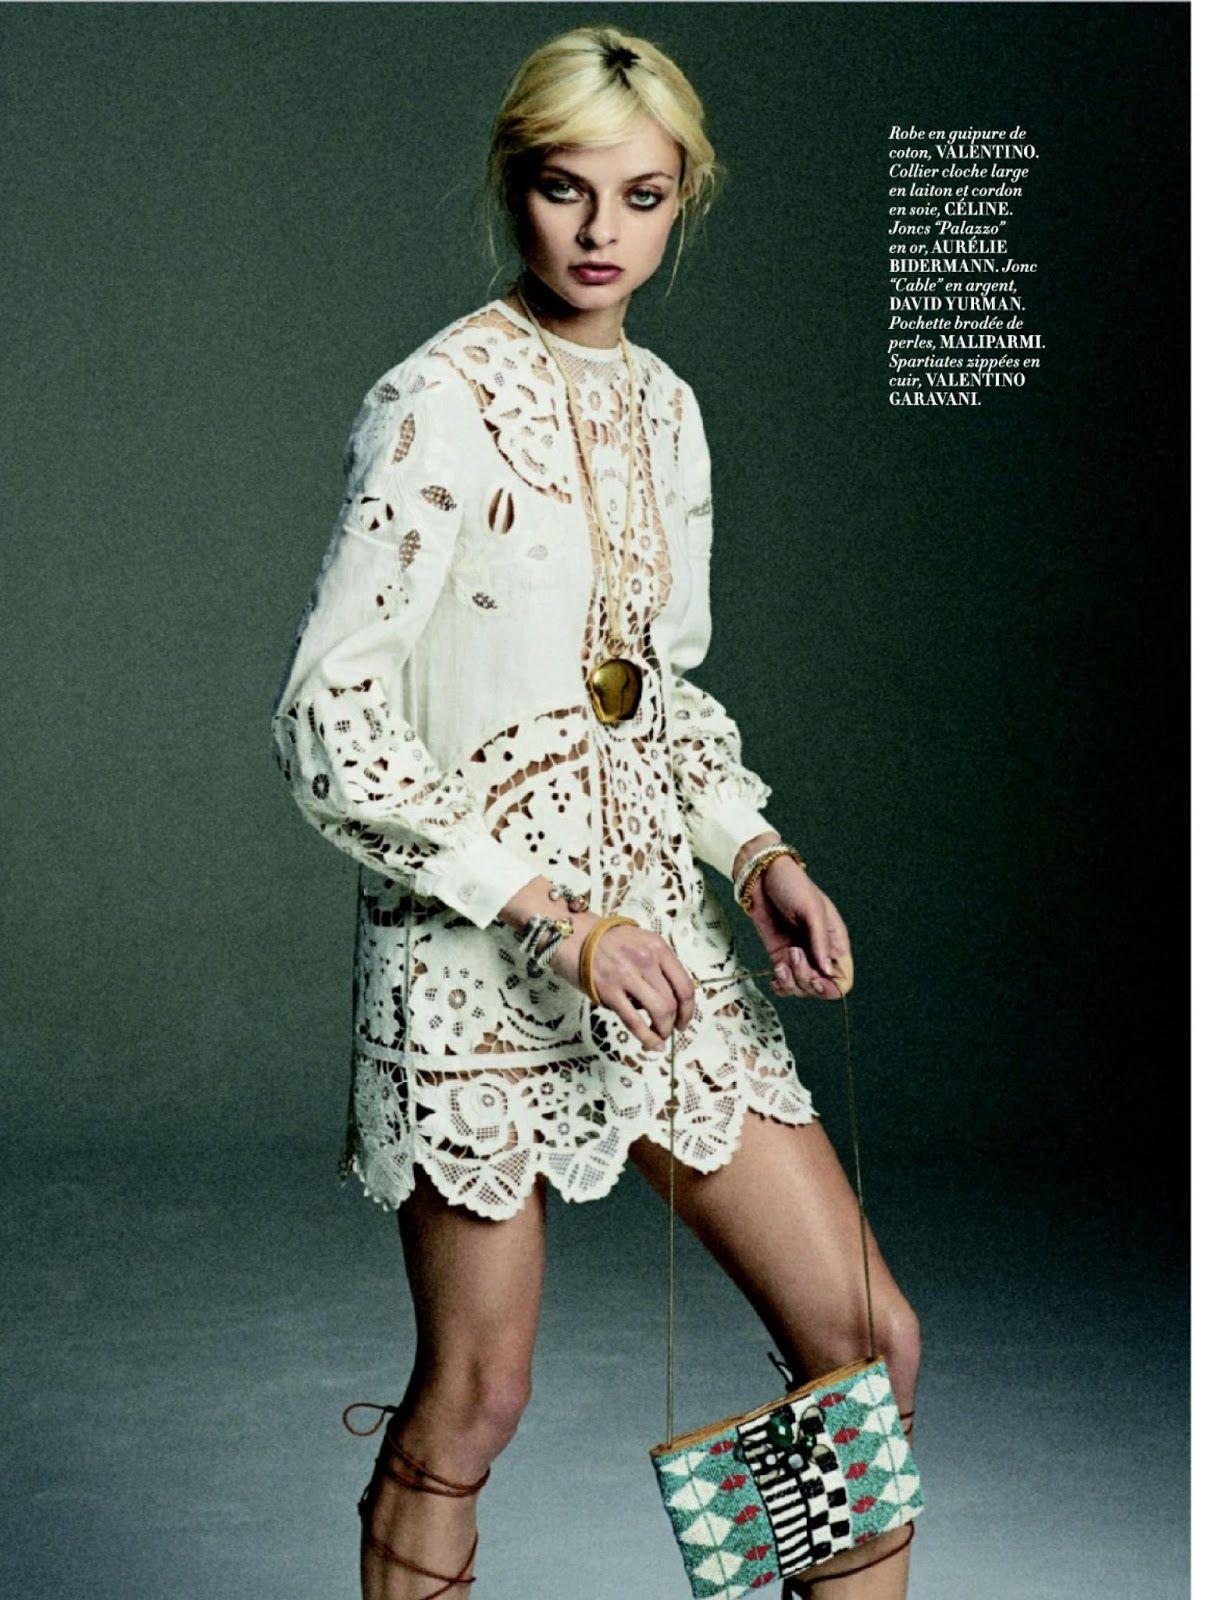 """Up & Down"" Lena Lomako for L'Officiel Paris May 2015"